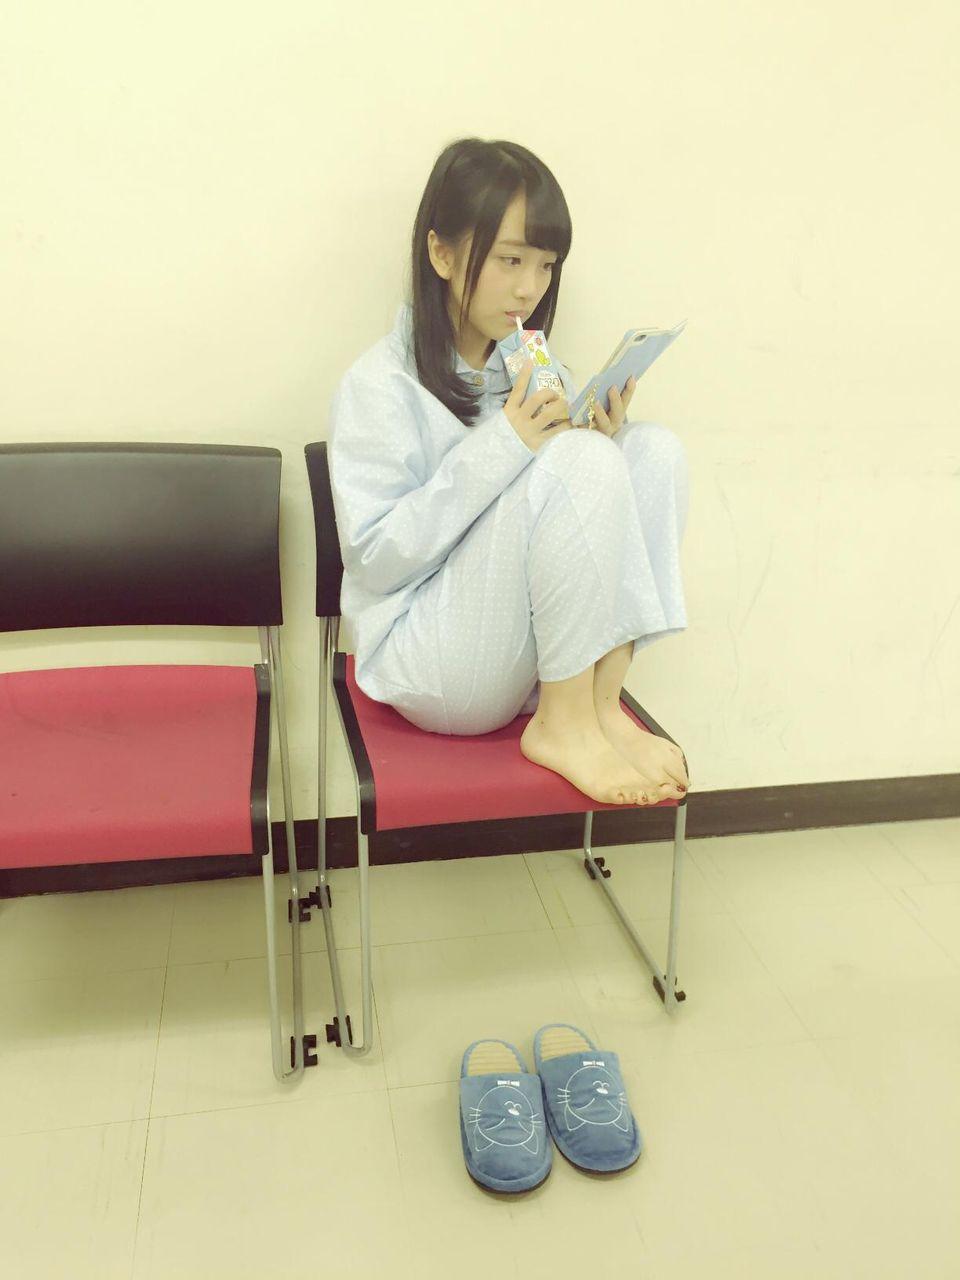 mukaichi mion sits down